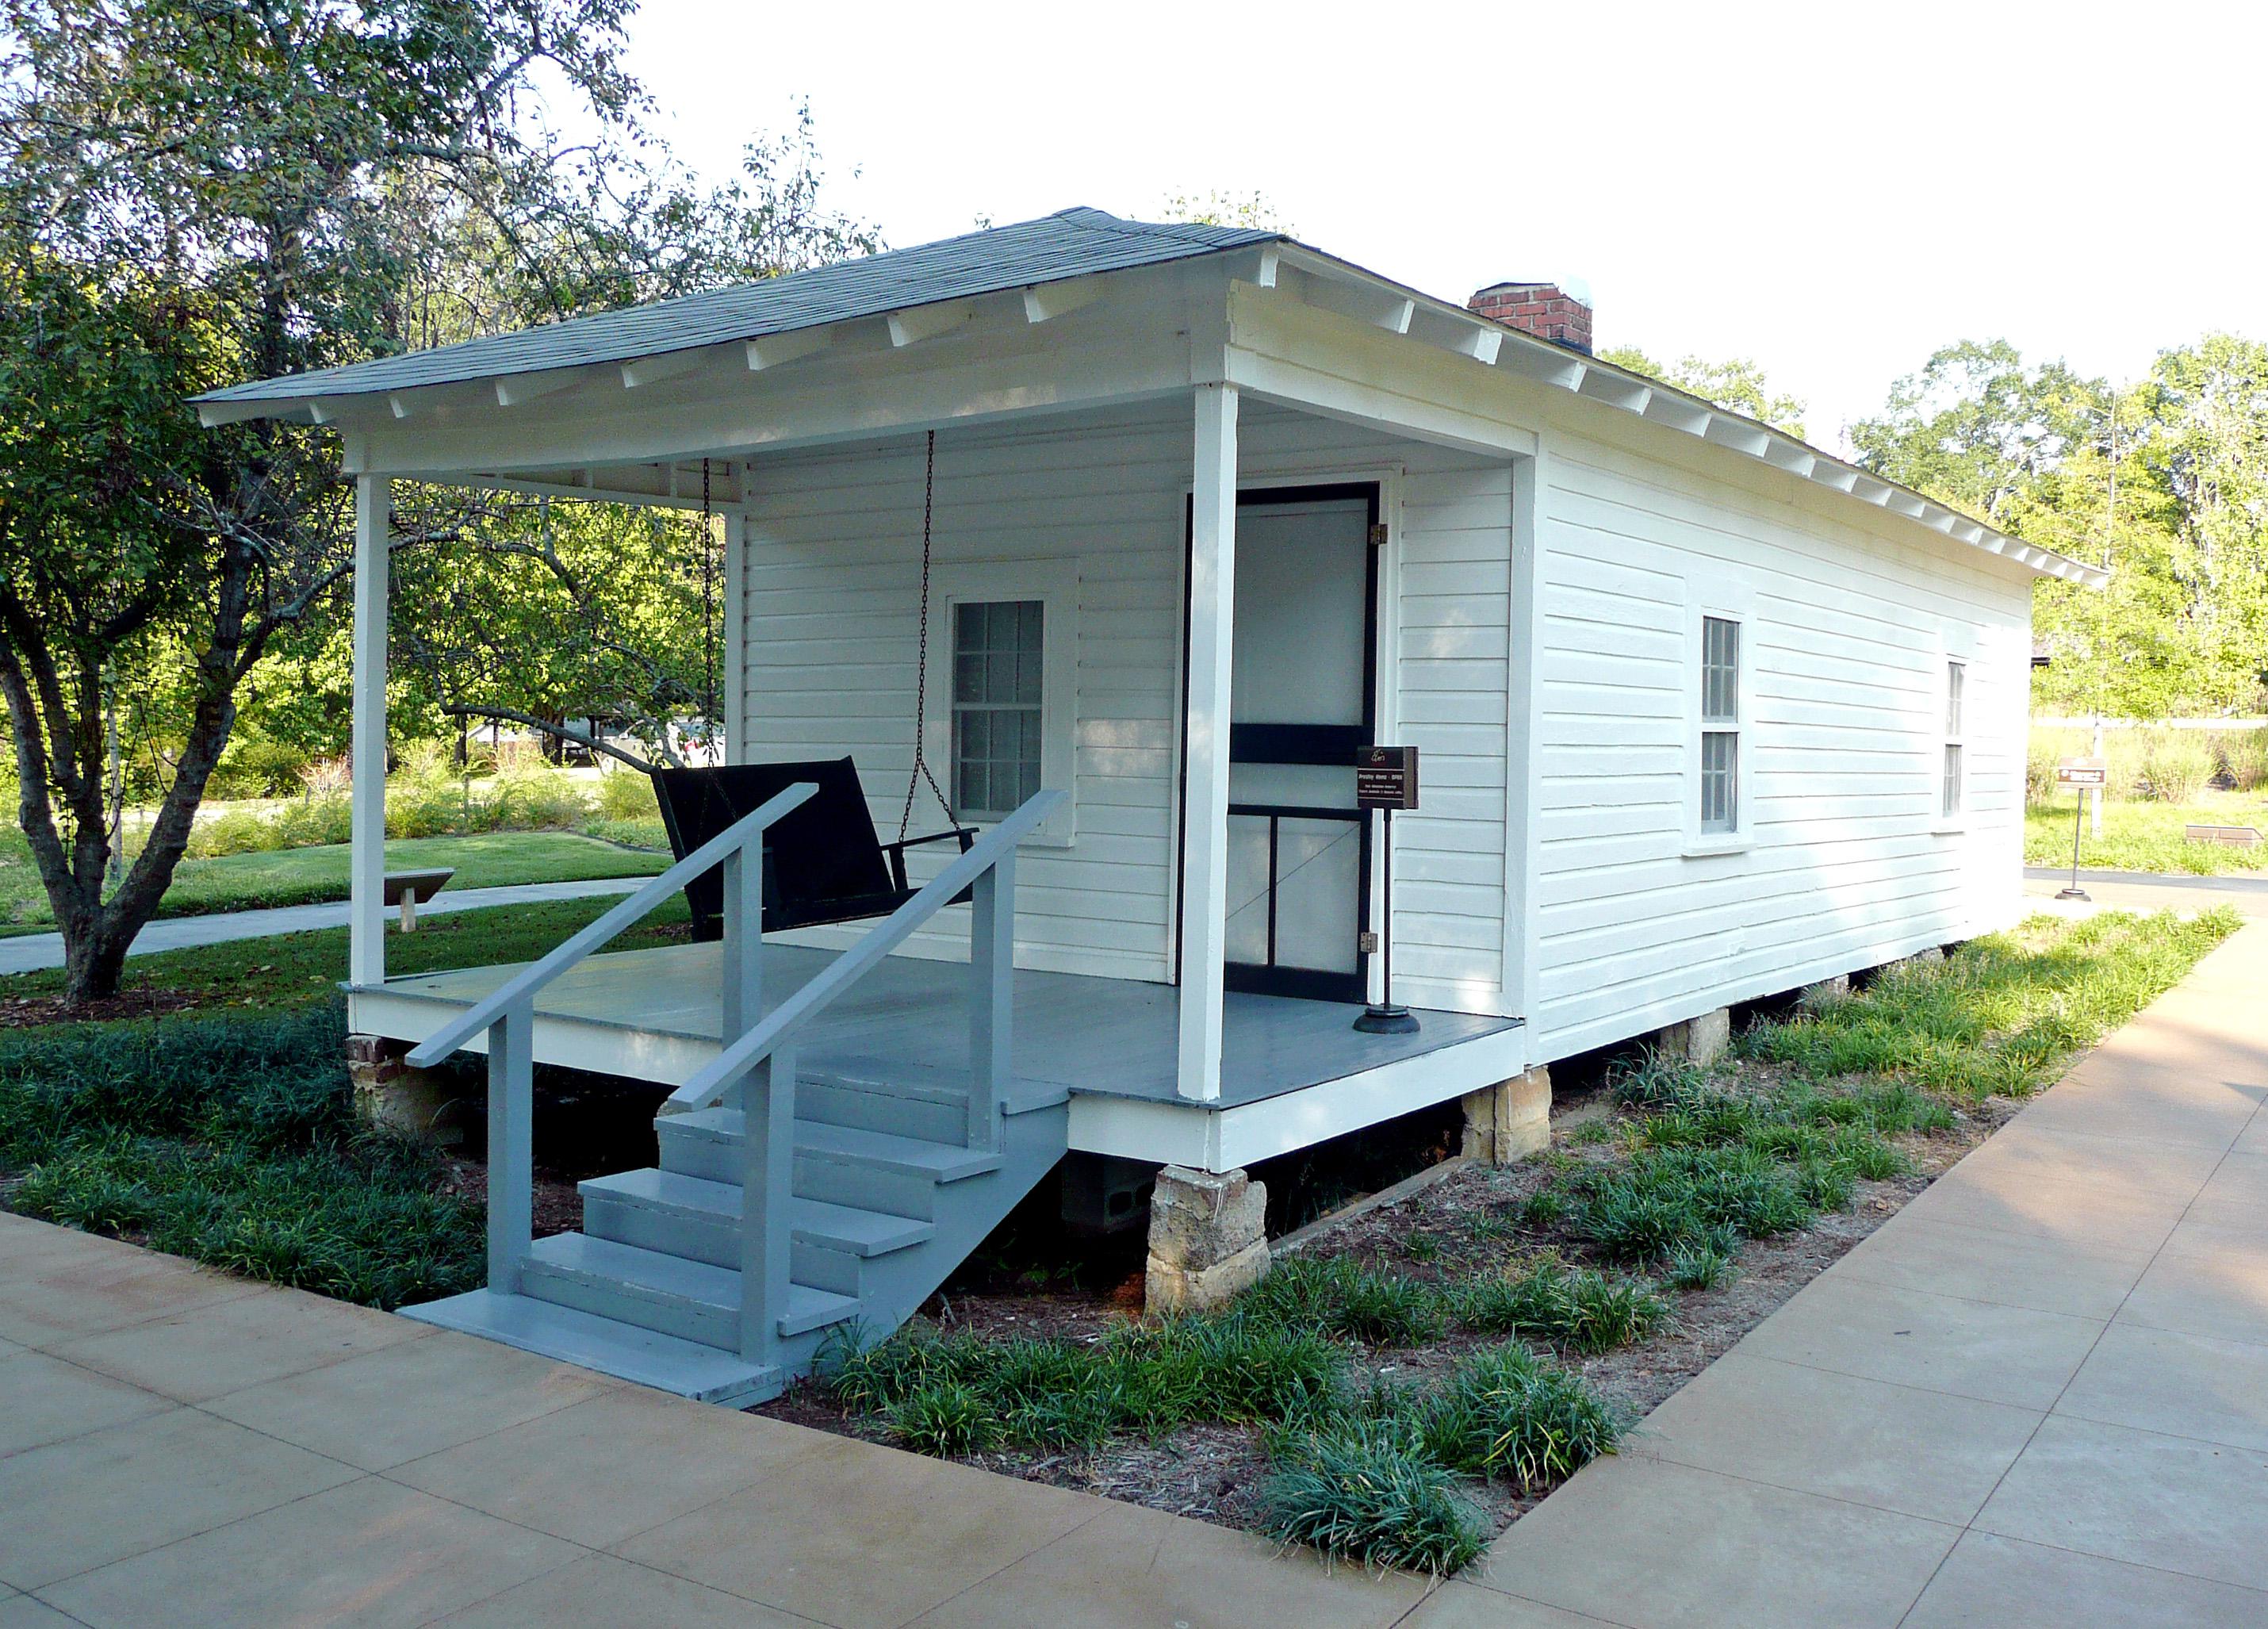 Elvis Presley's birthplace in Tupelo, Mississippi. Photo taken on November 7, 2007.